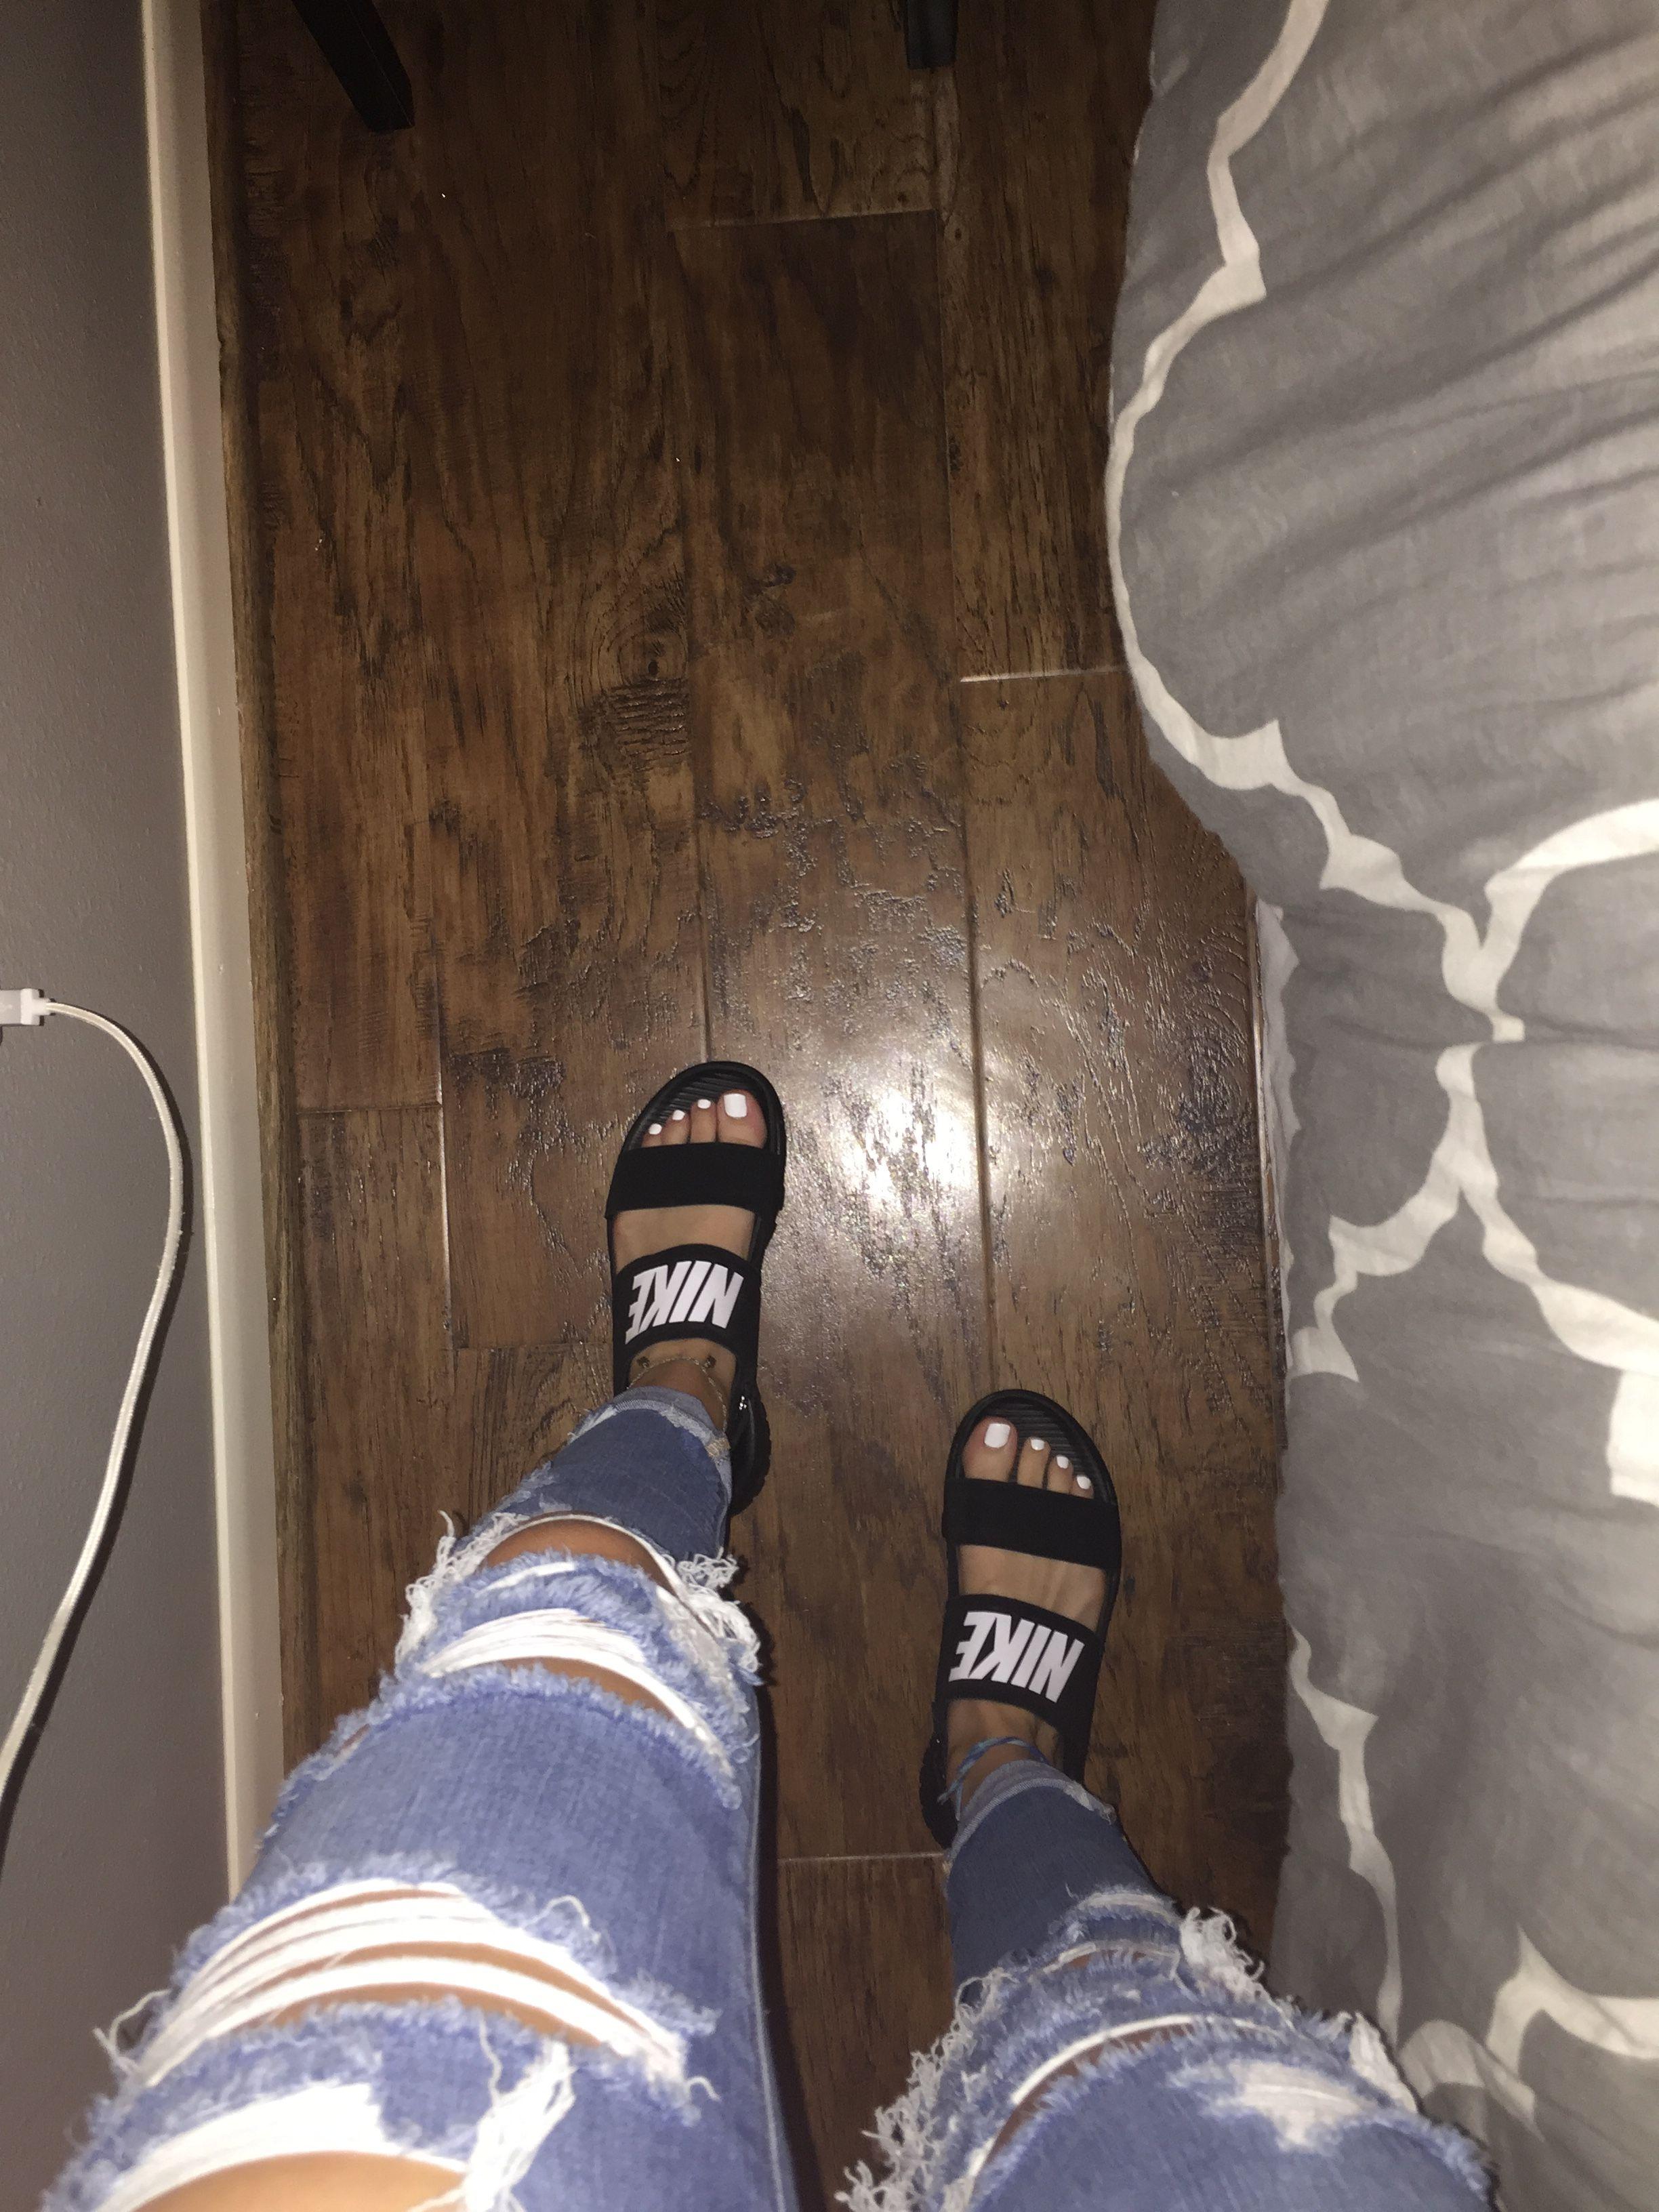 Black Nike Tanjun Sandals | Nike sandals, Black nike shoes ...